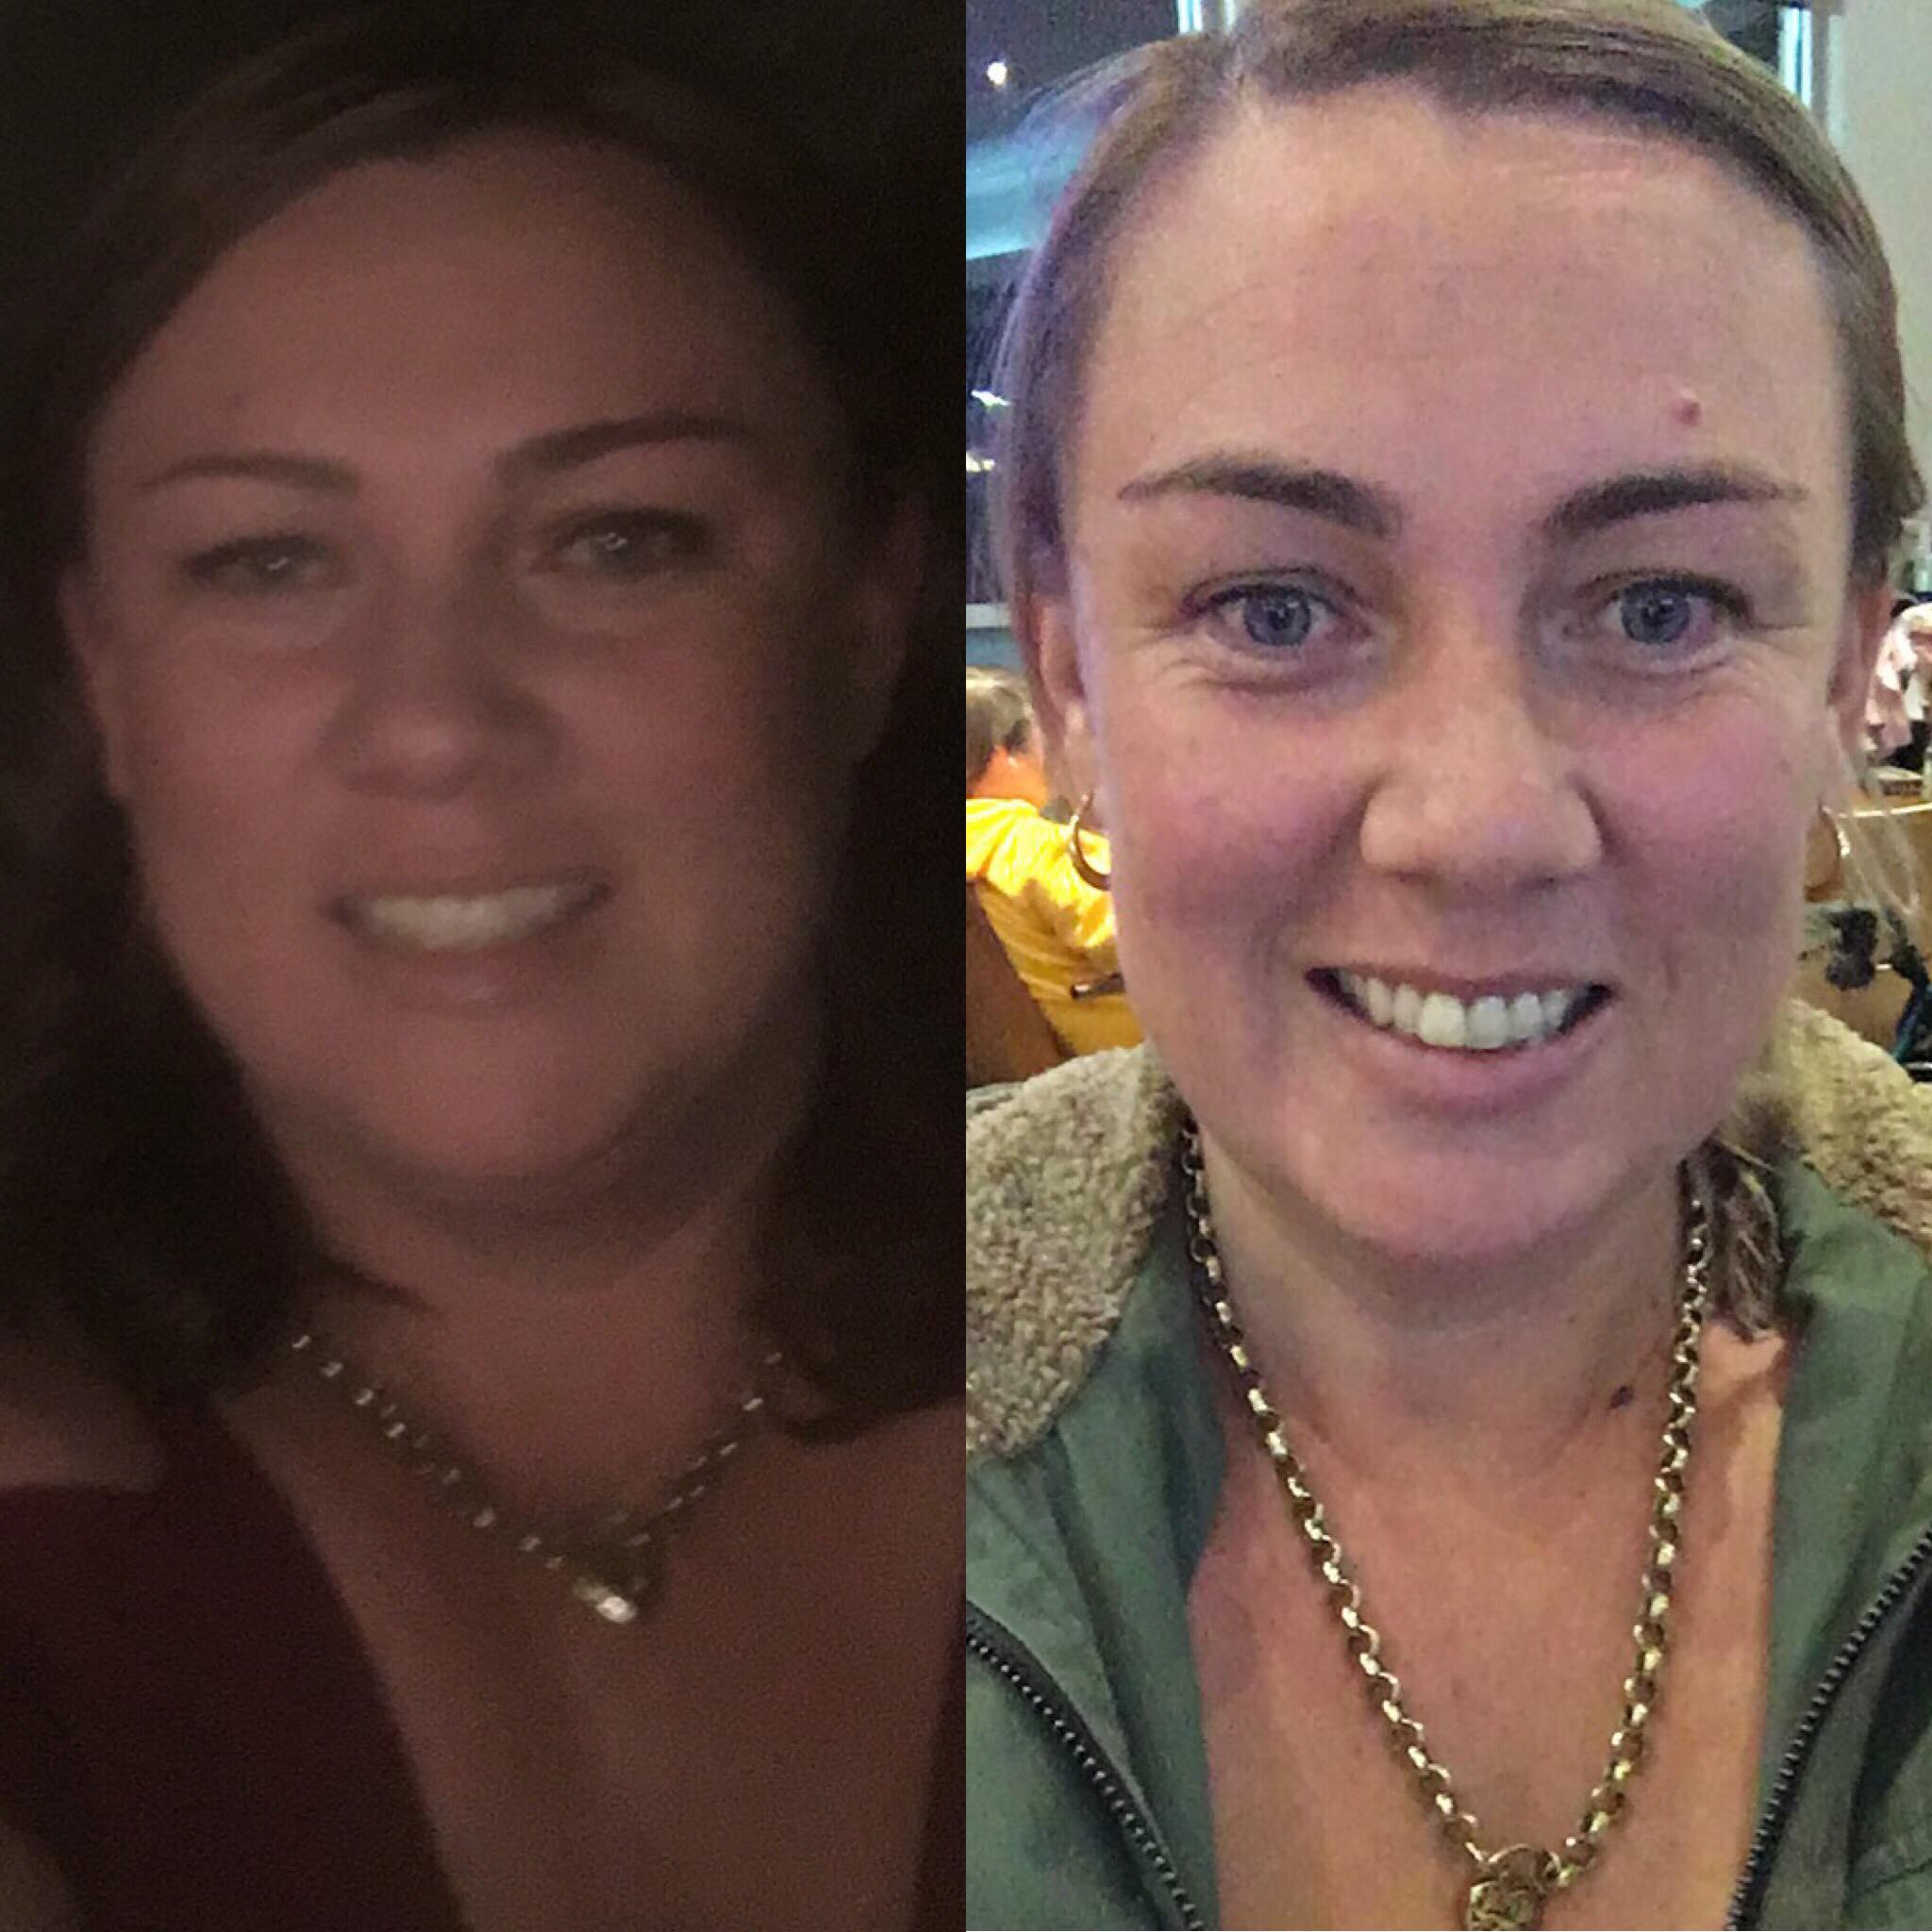 Paula's 2 months post op gastric sleeve surgery - lost 22 kgs